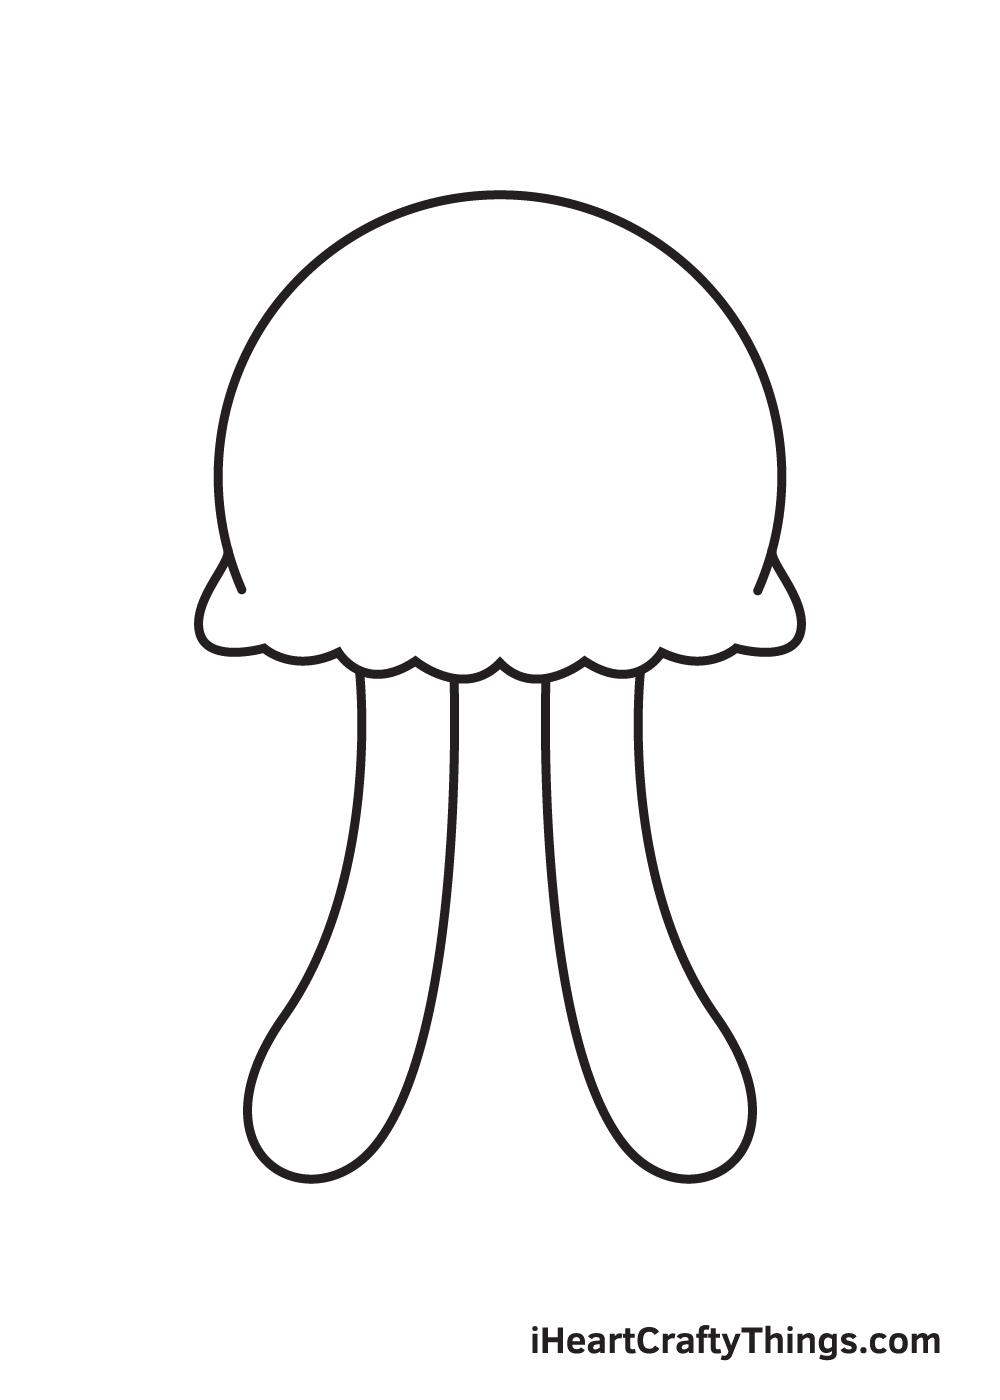 jellyfish drawing step 4